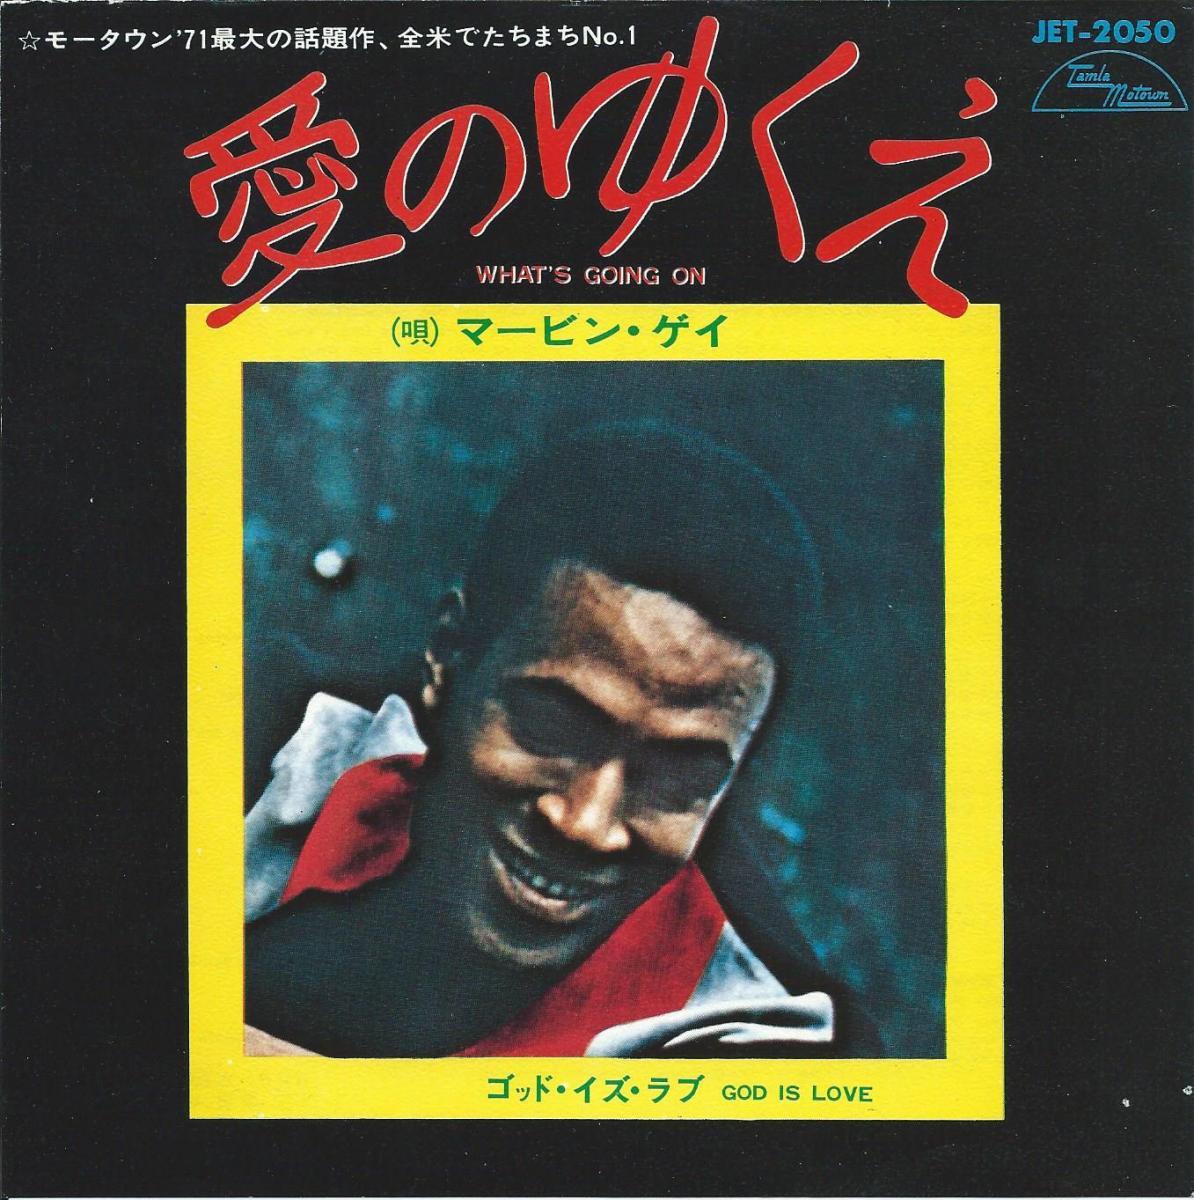 Marvin Gaye マービン・ゲイ = Marvin Gaye - 黒い夜